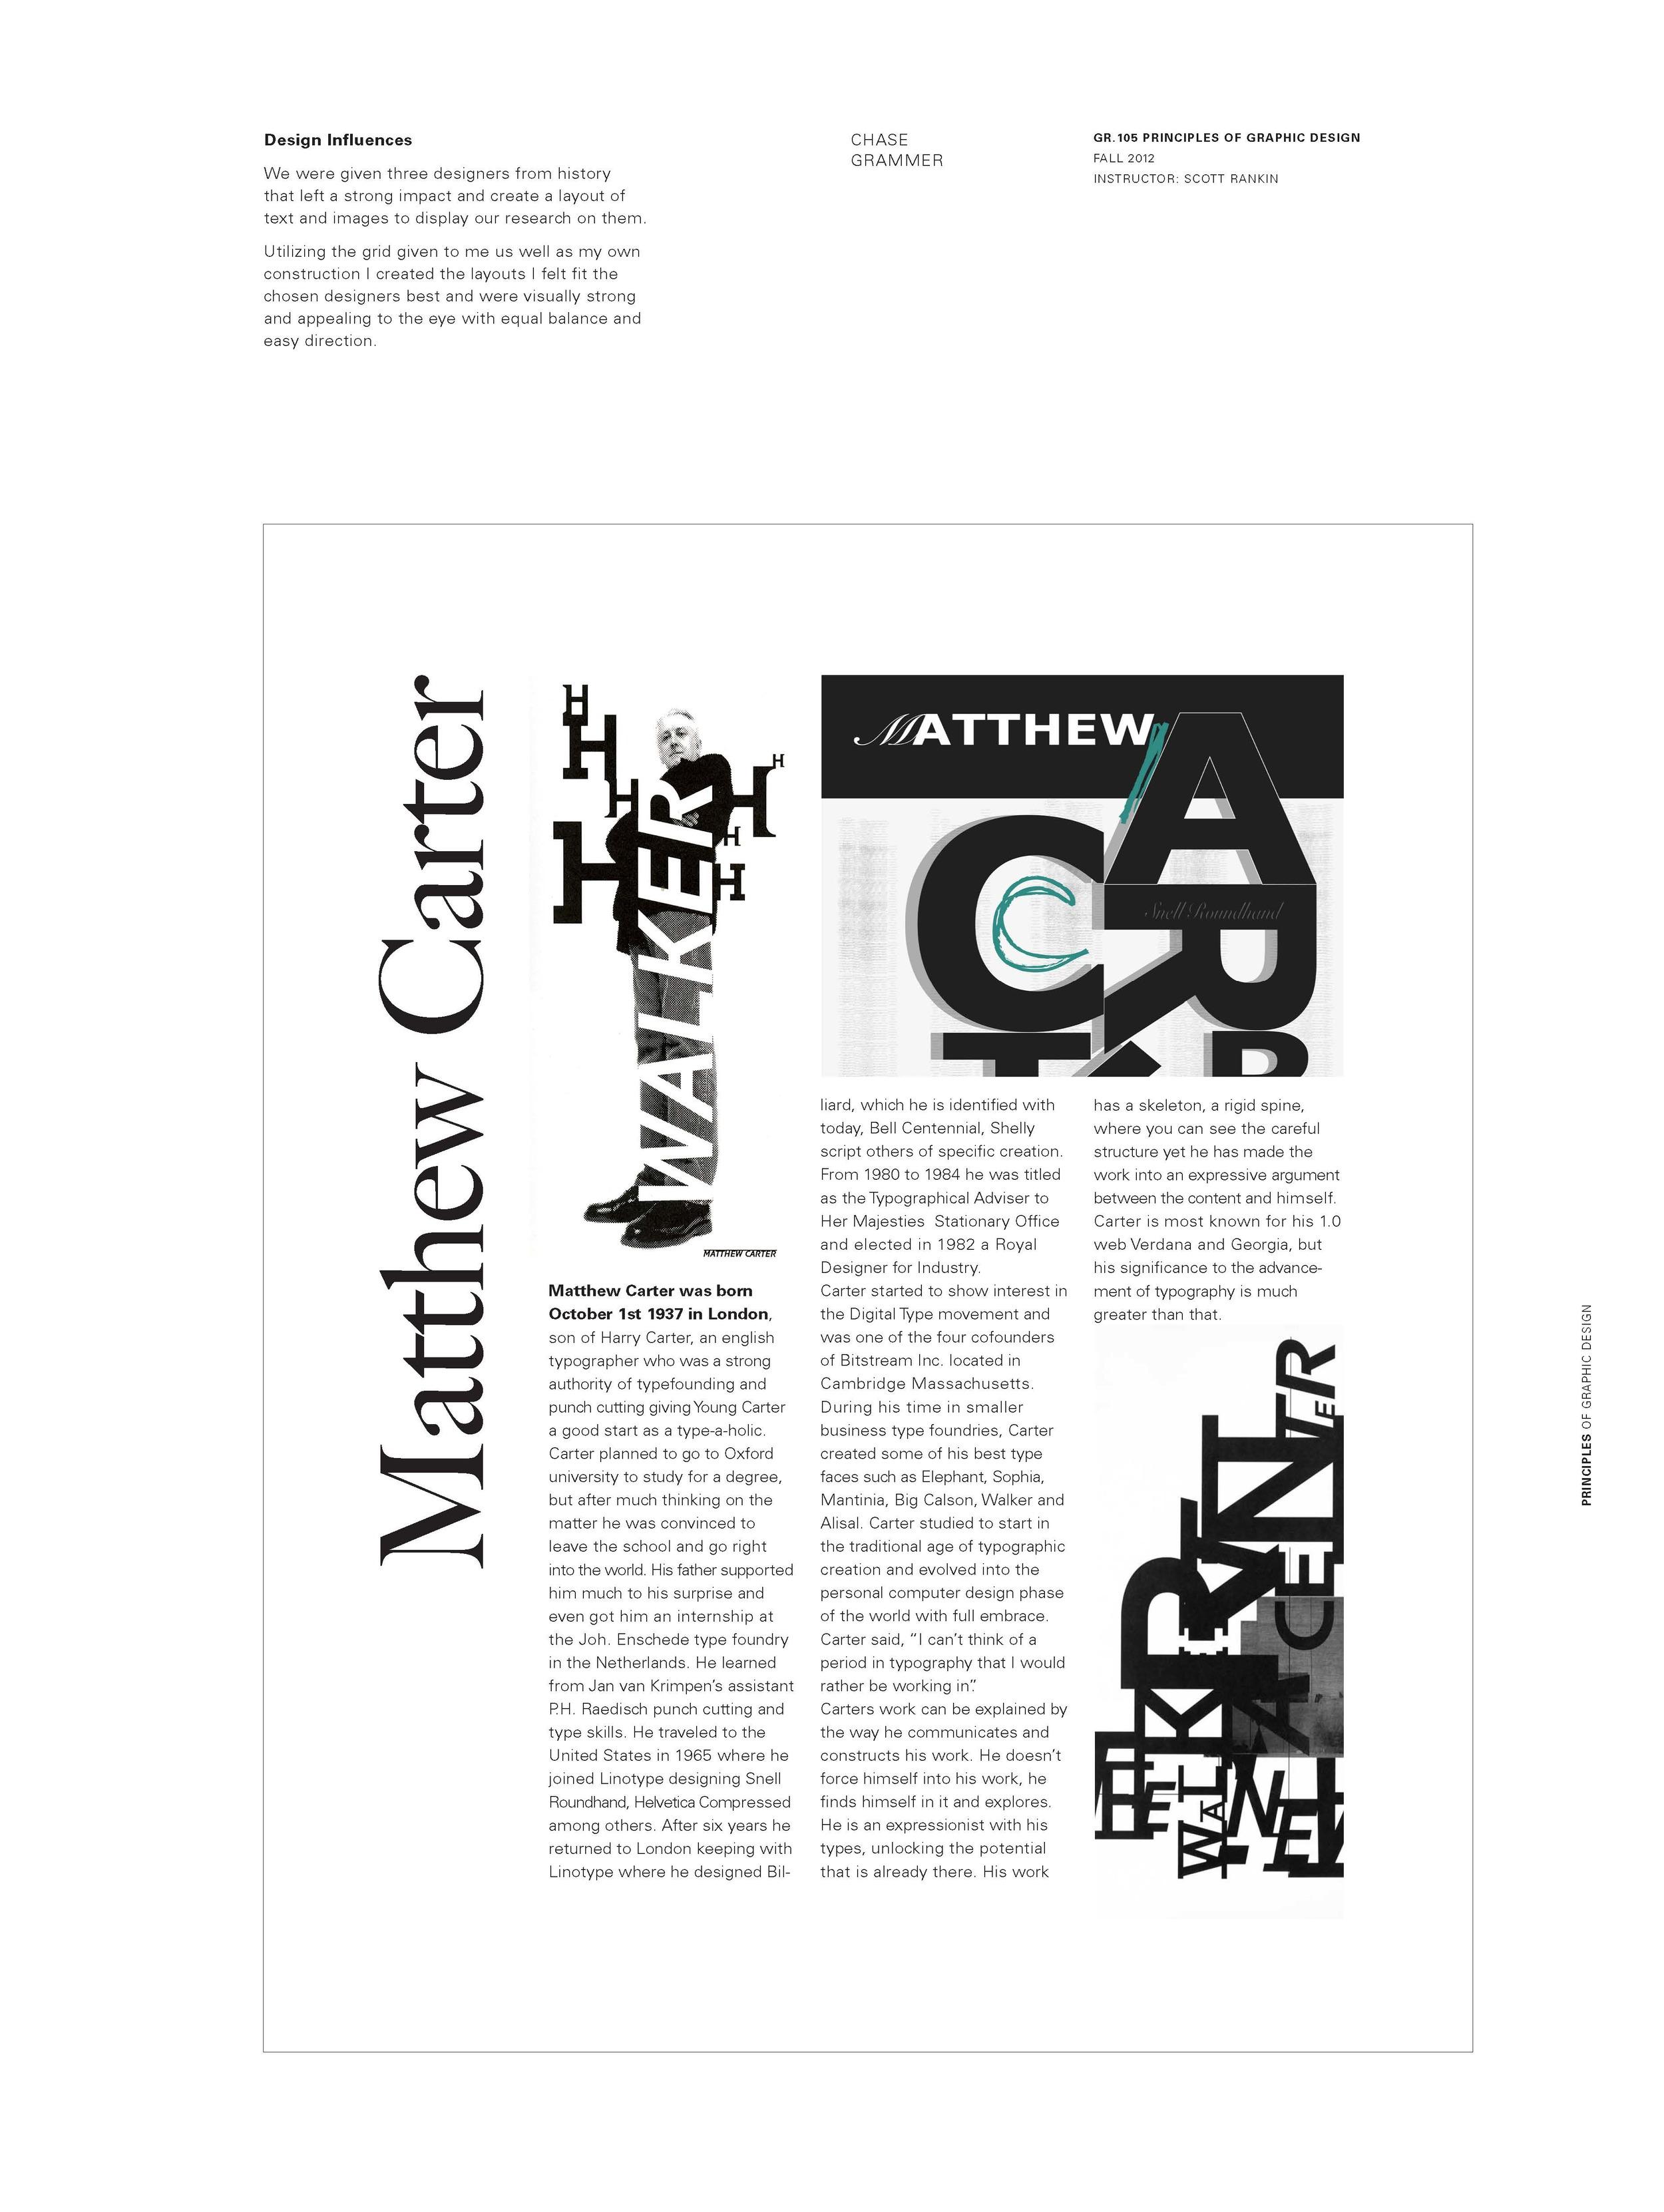 ScottFinal copy_Page_08.jpg